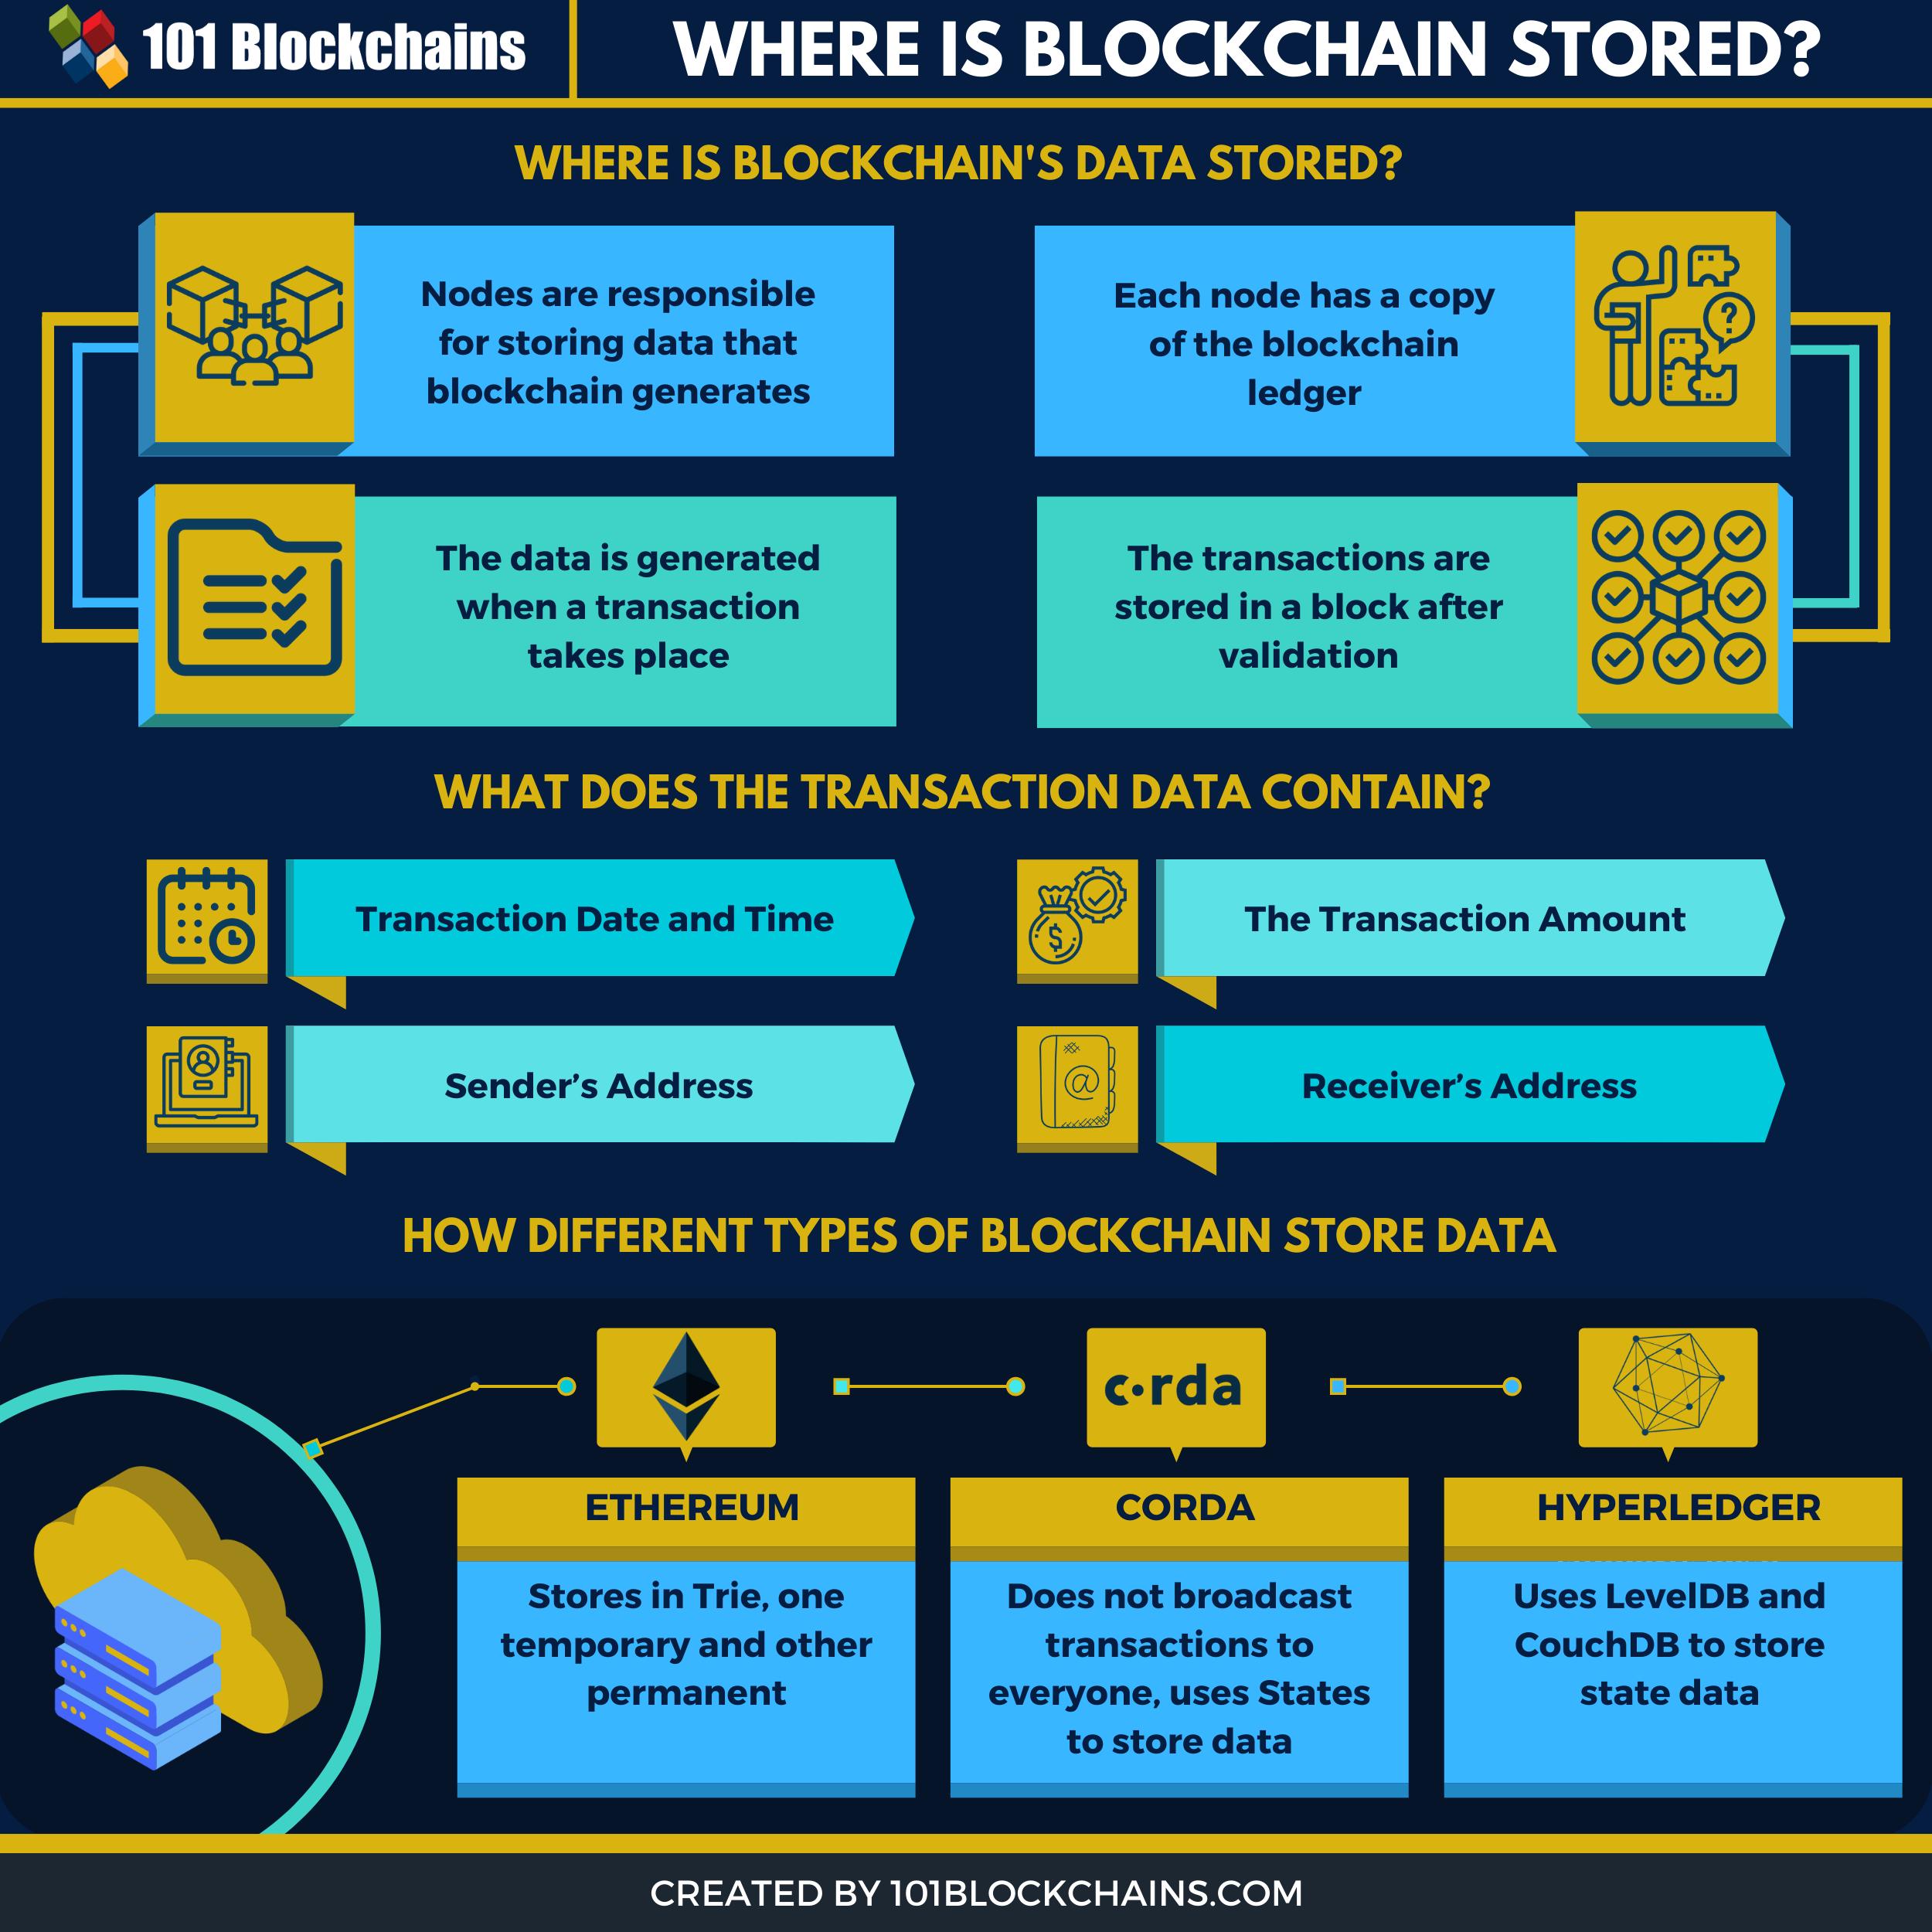 where blockchain is stored